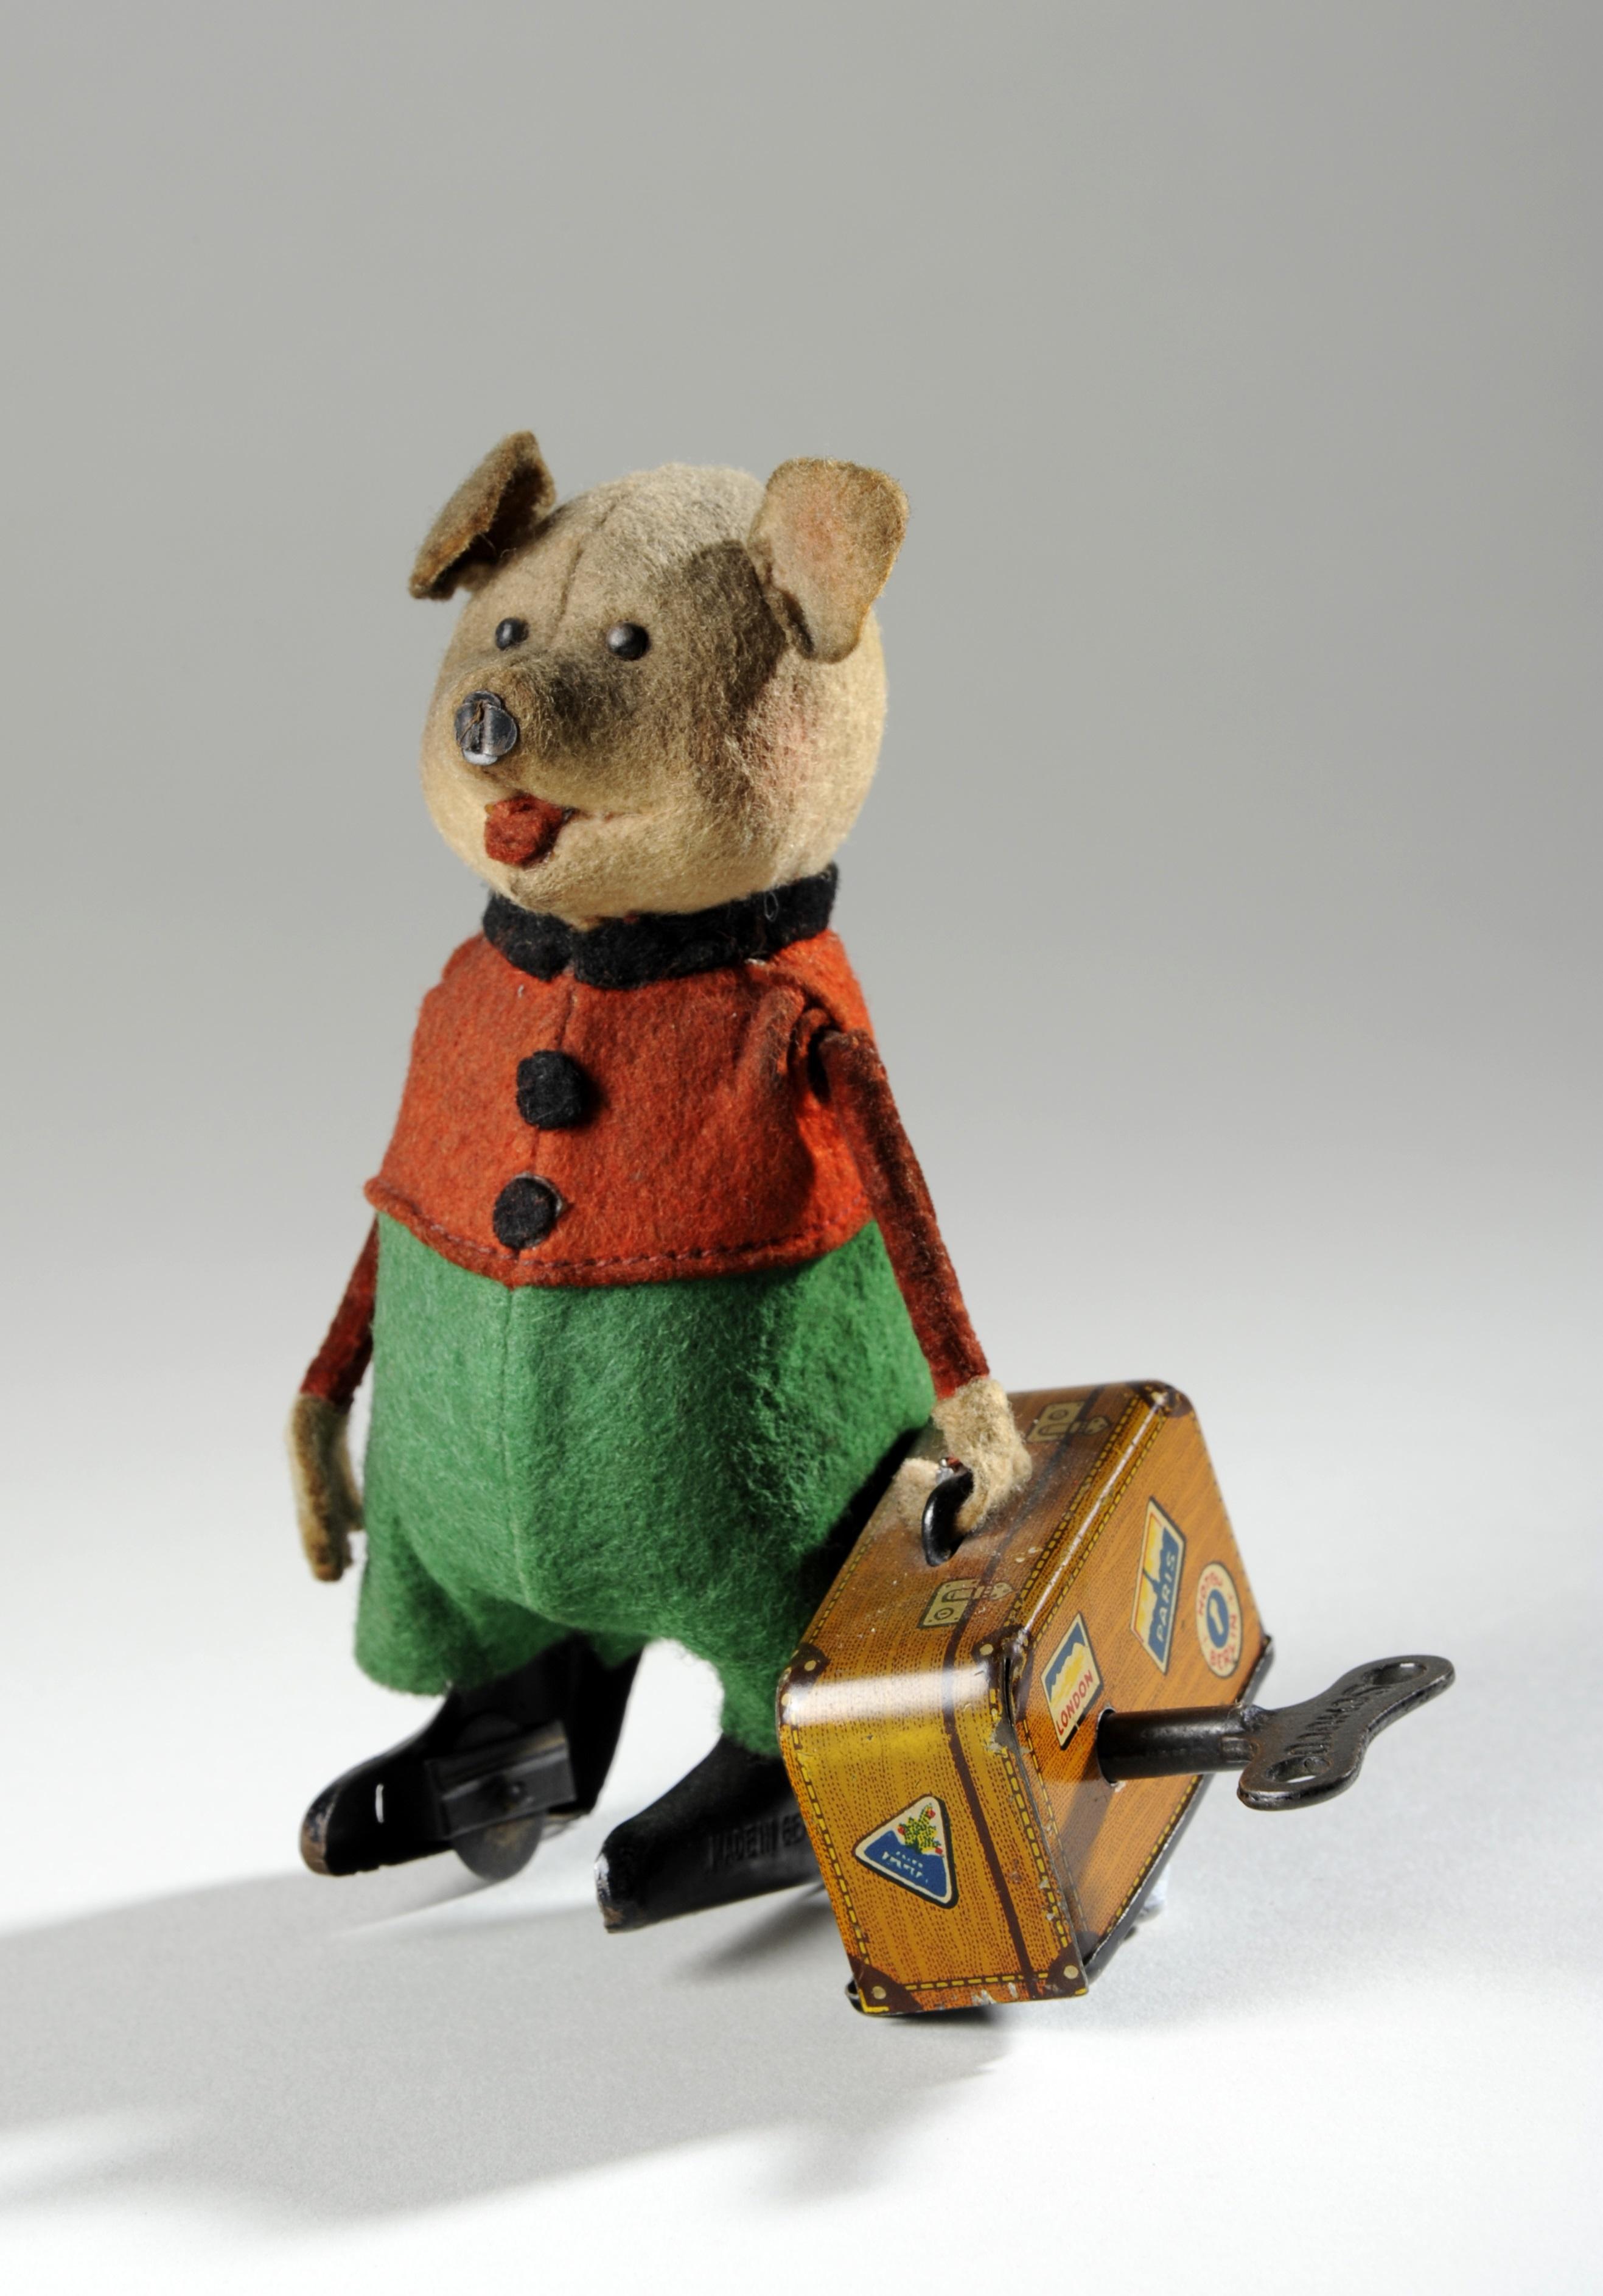 Clockwork toy pig c.1935 made by Schuco